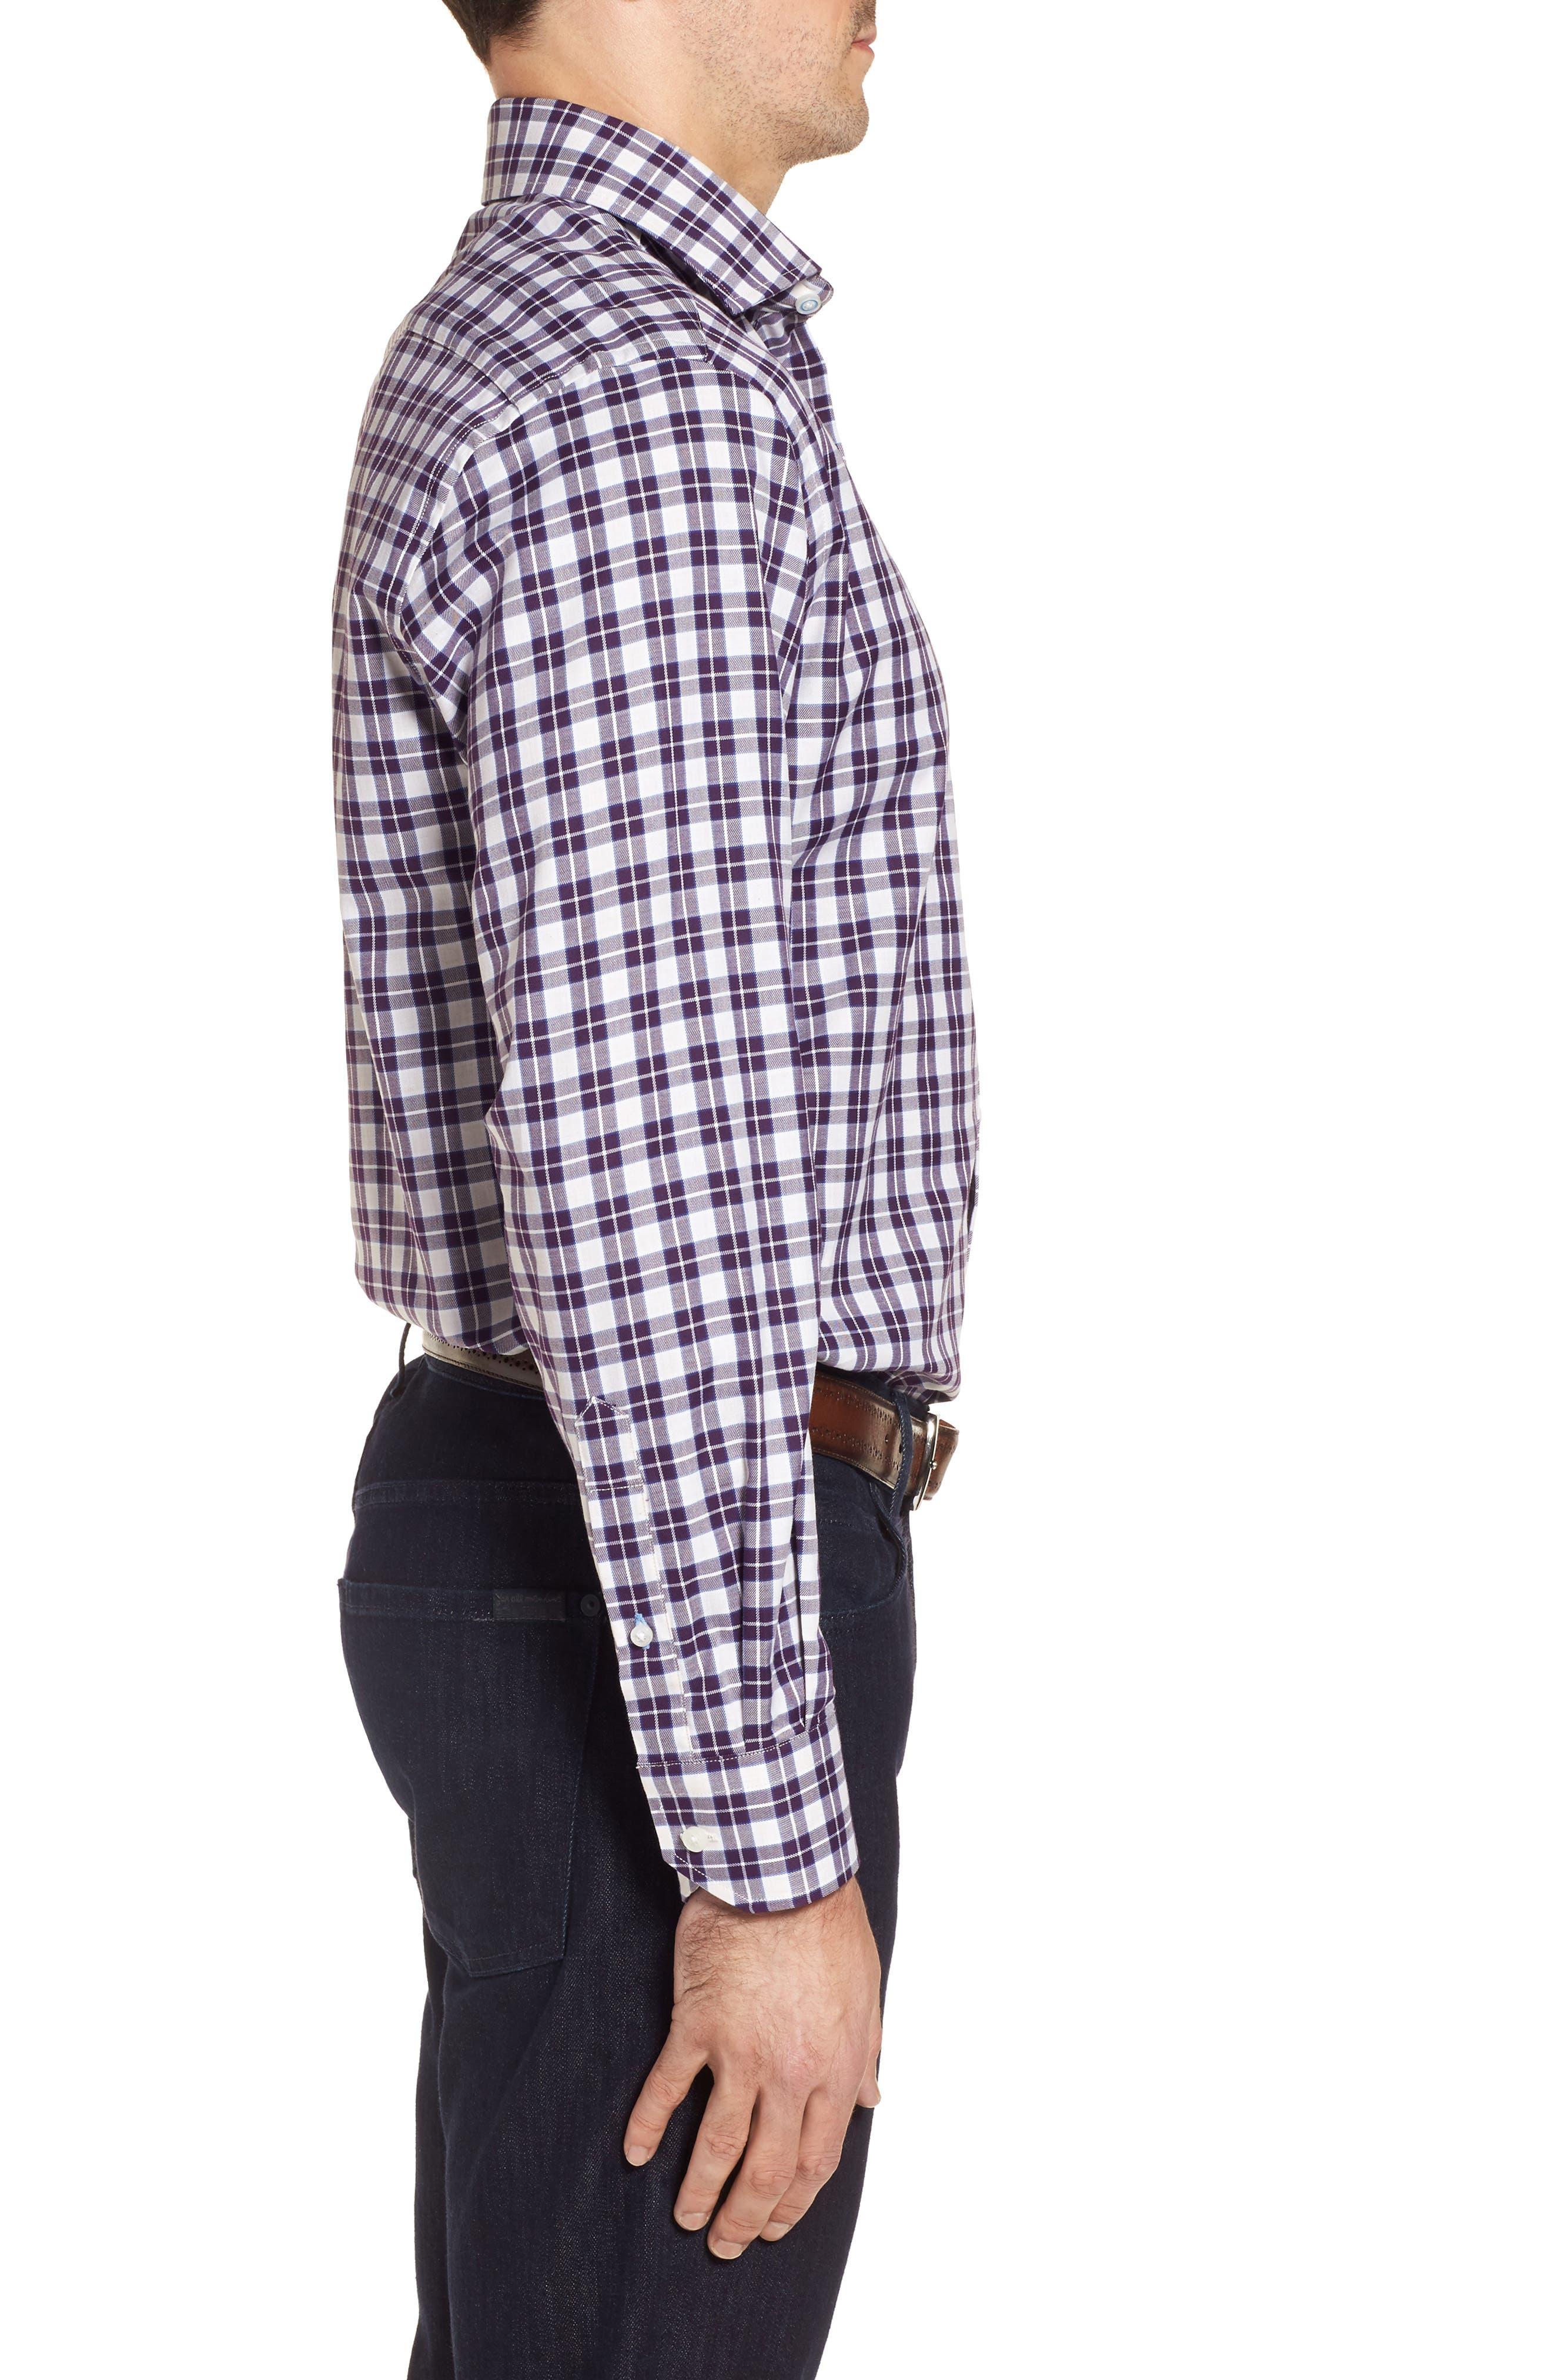 Alternate Image 3  - TailorByrd Chalmette Check Twill Sport Shirt